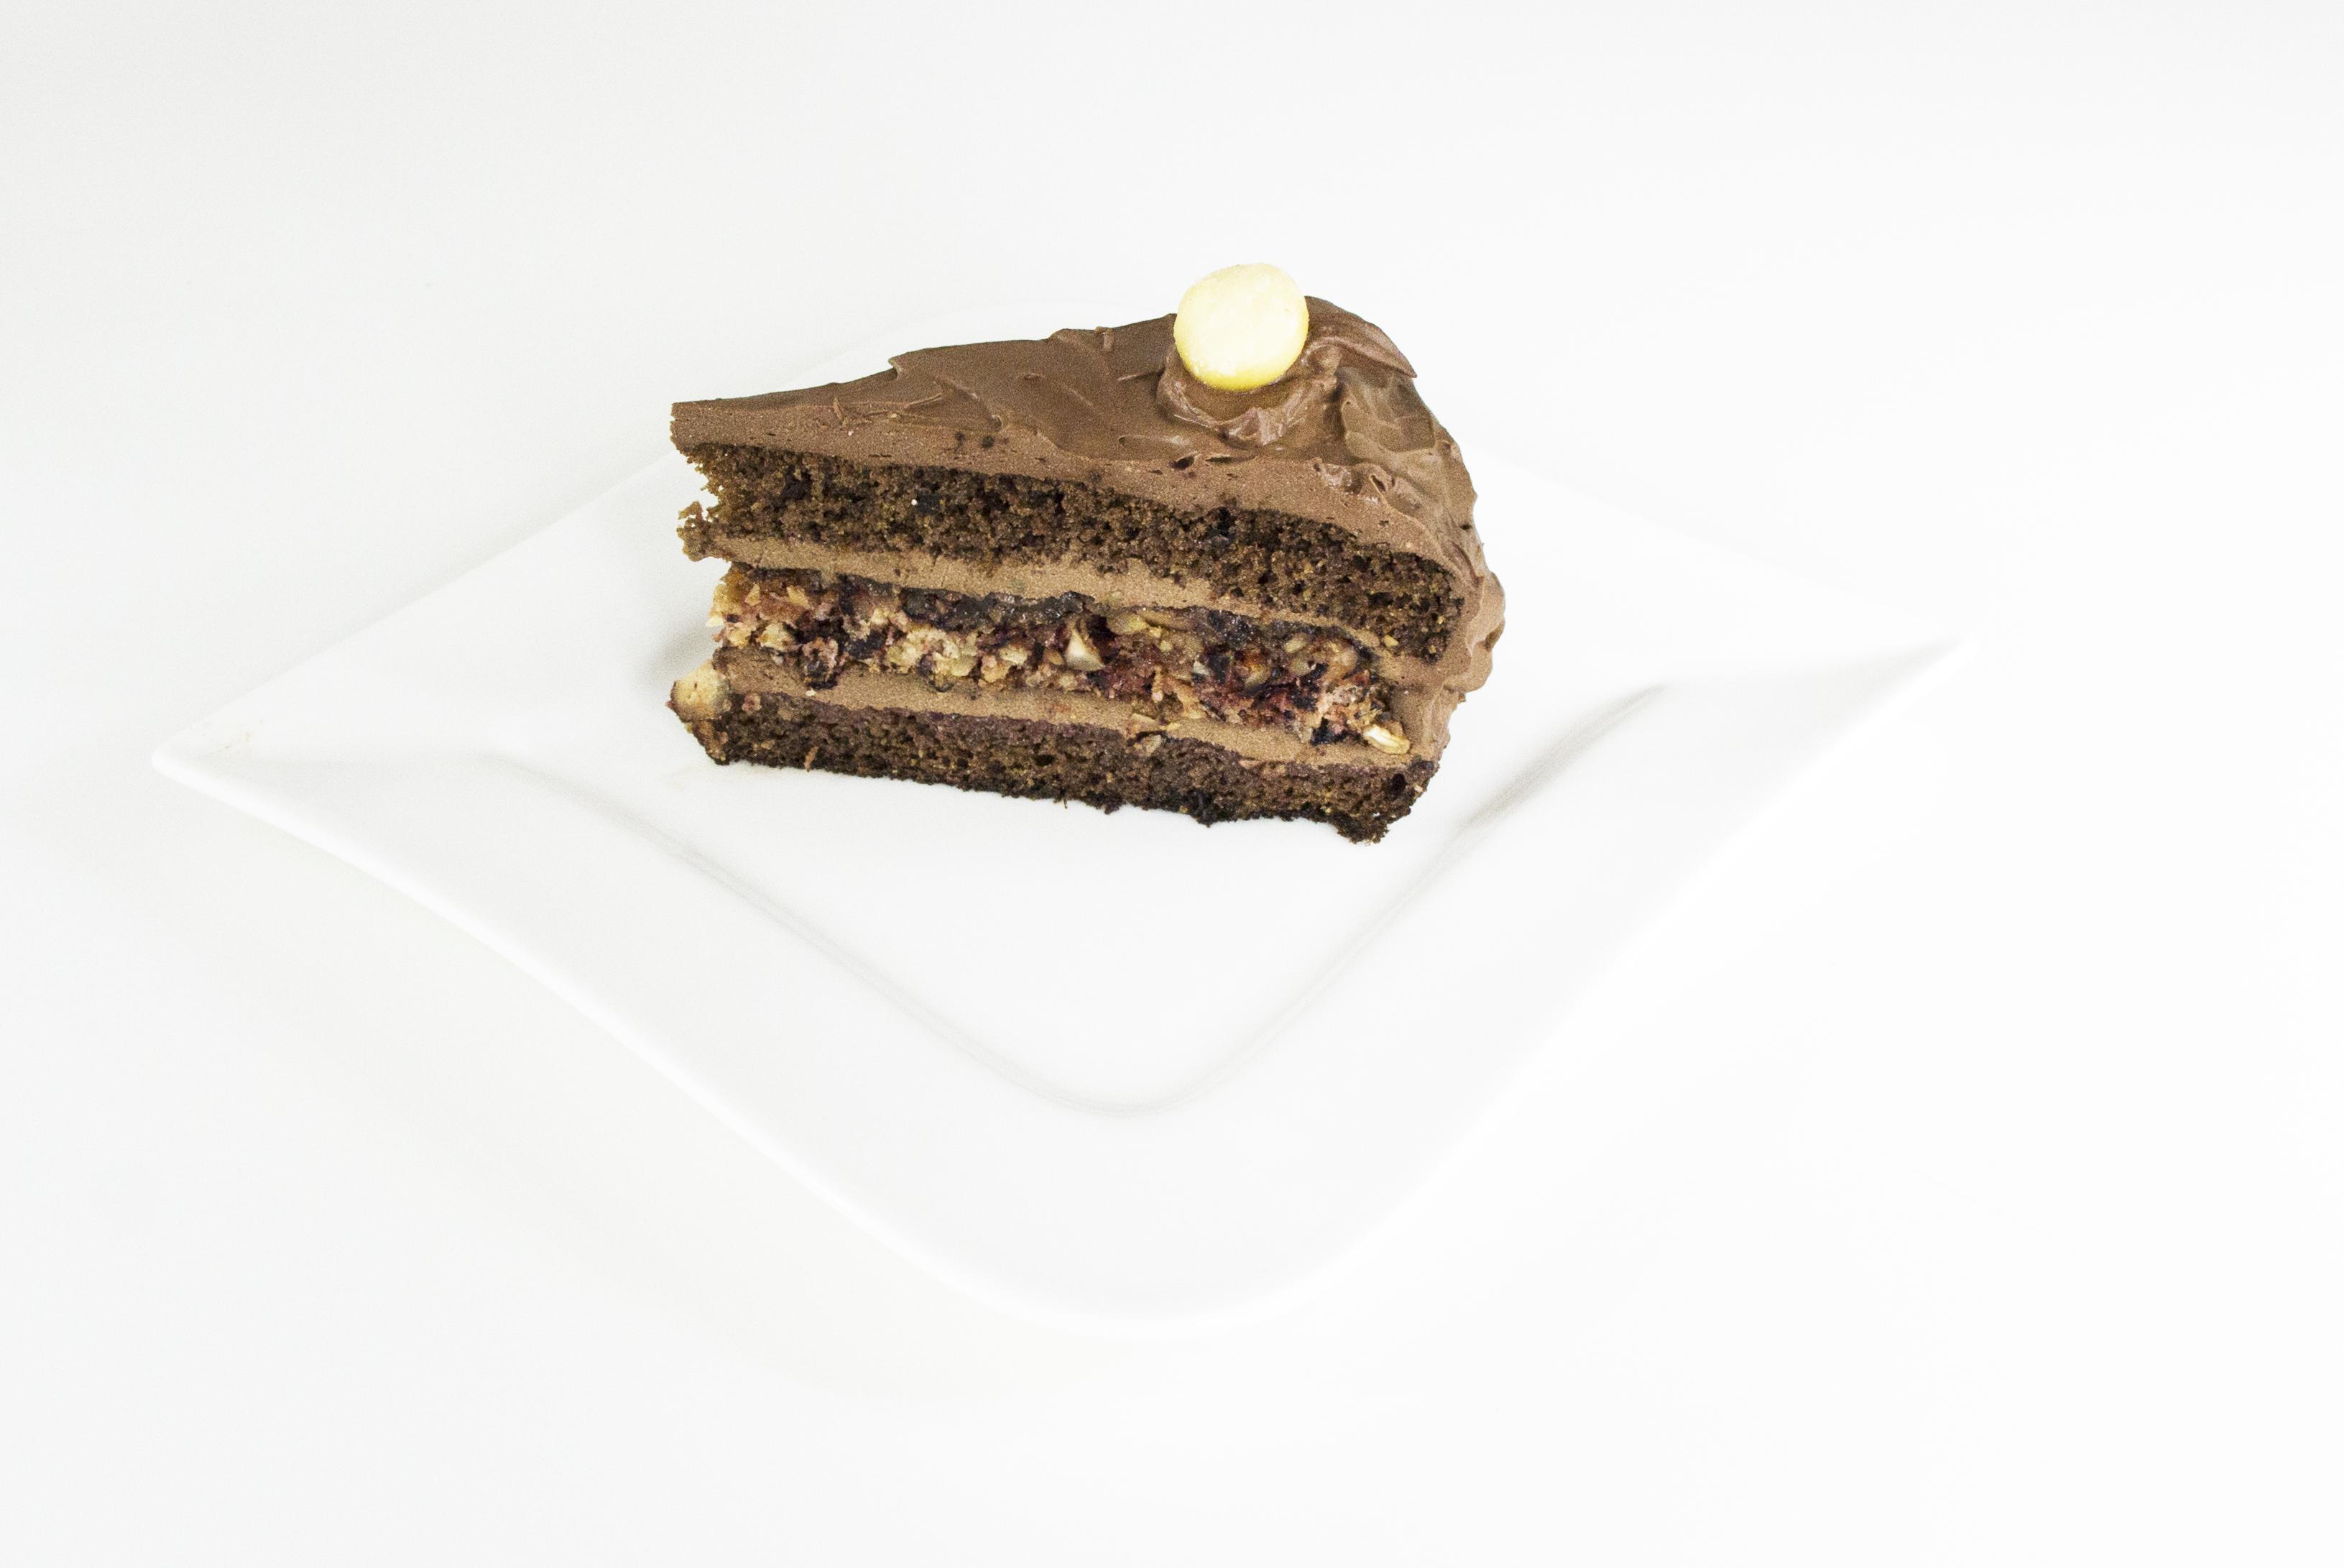 Piece of cake :D